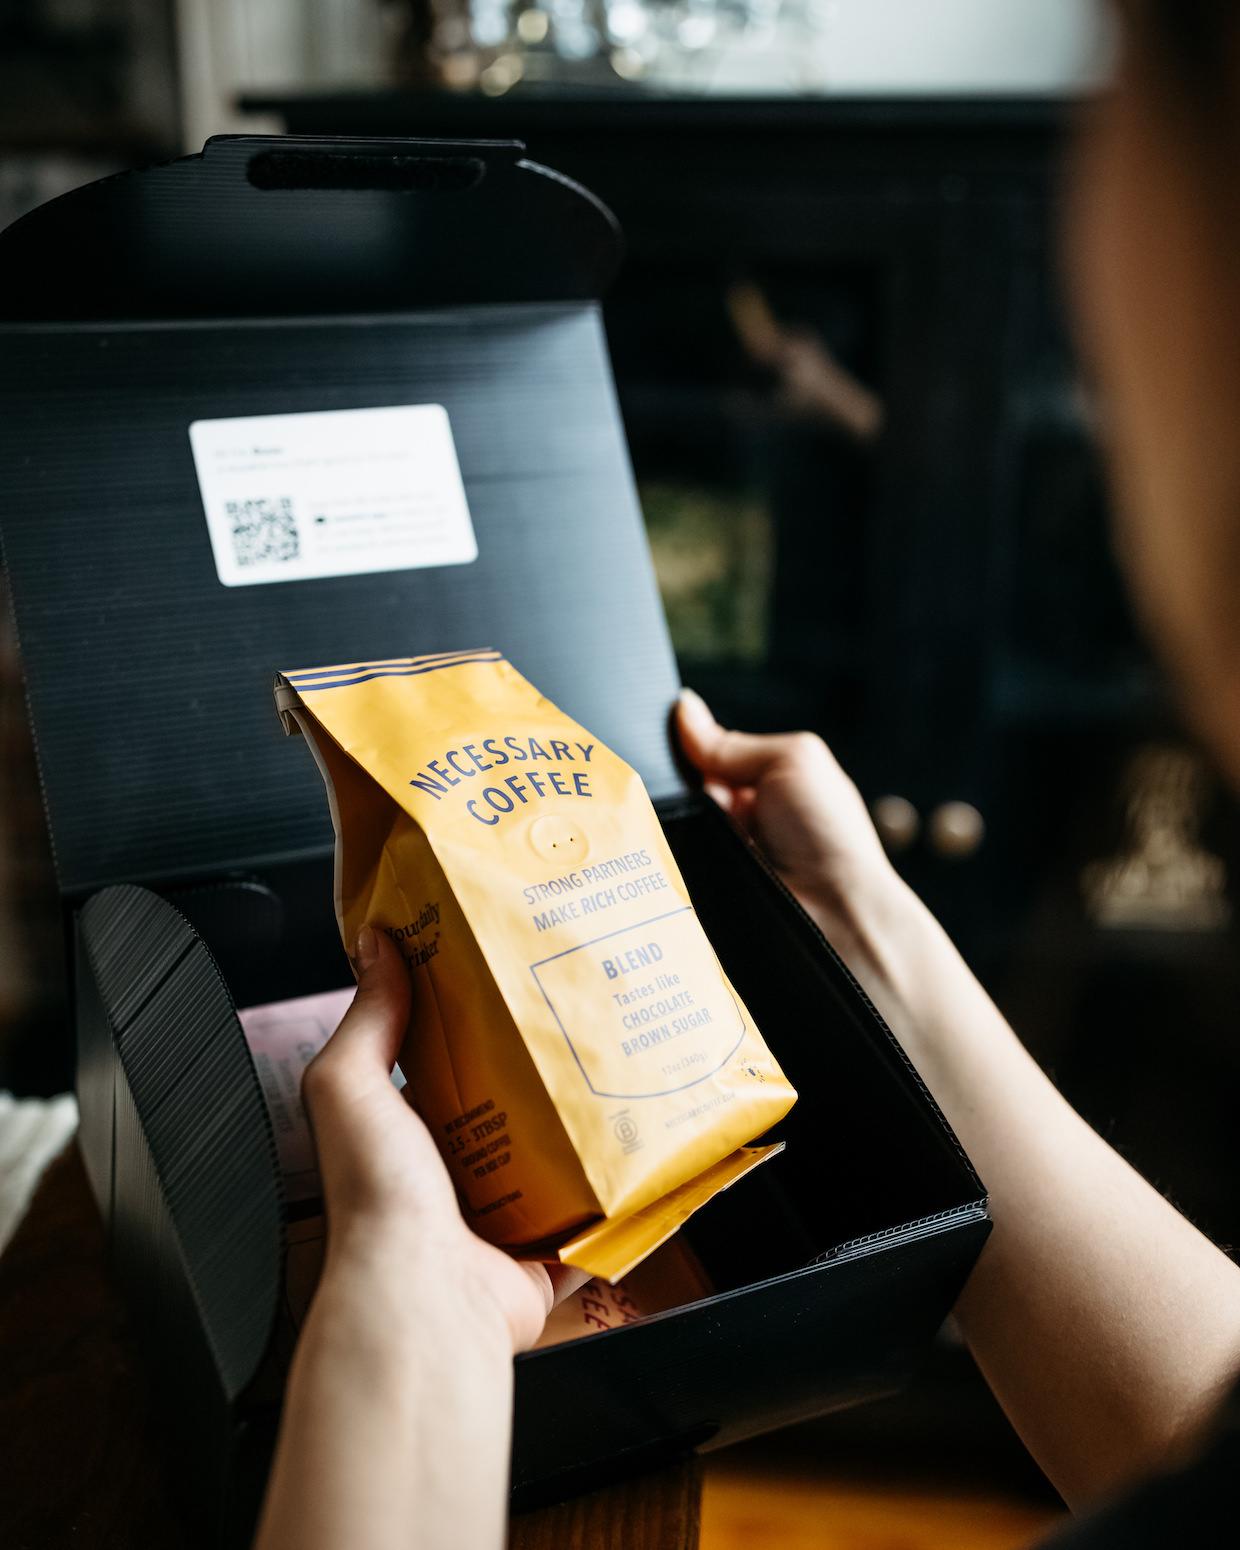 Passenger Coffee Boox 3